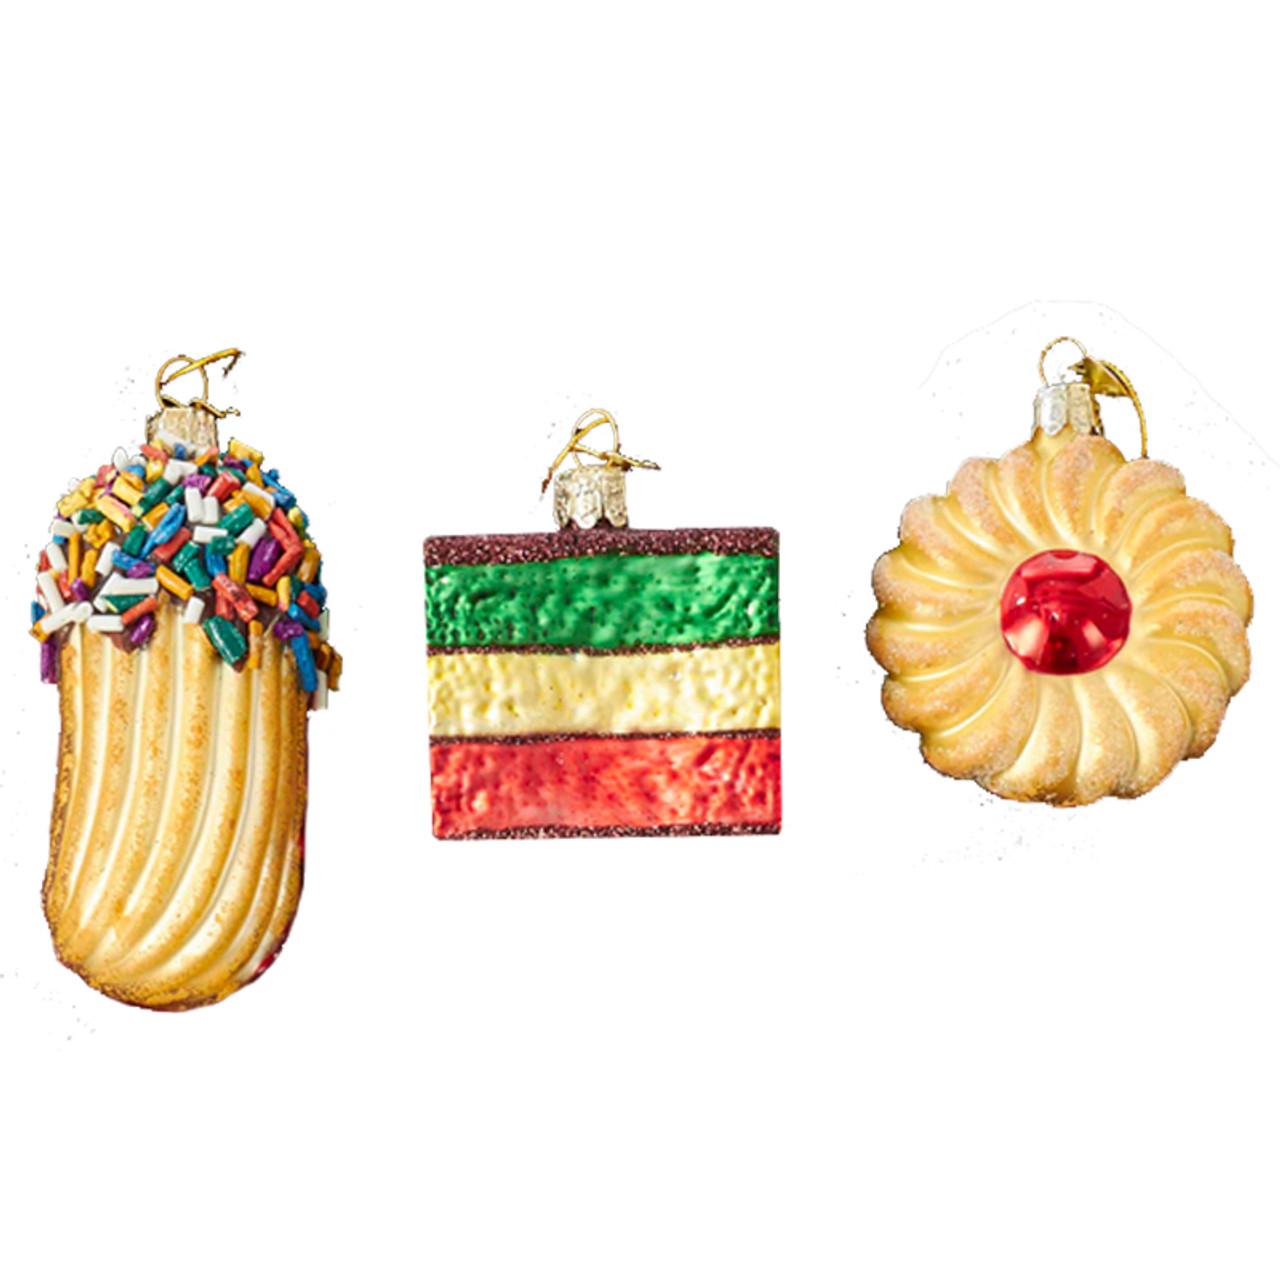 Glass Fruit Ornaments Kurt Adler Noble Gem Food  Christmas  Price Is For Each